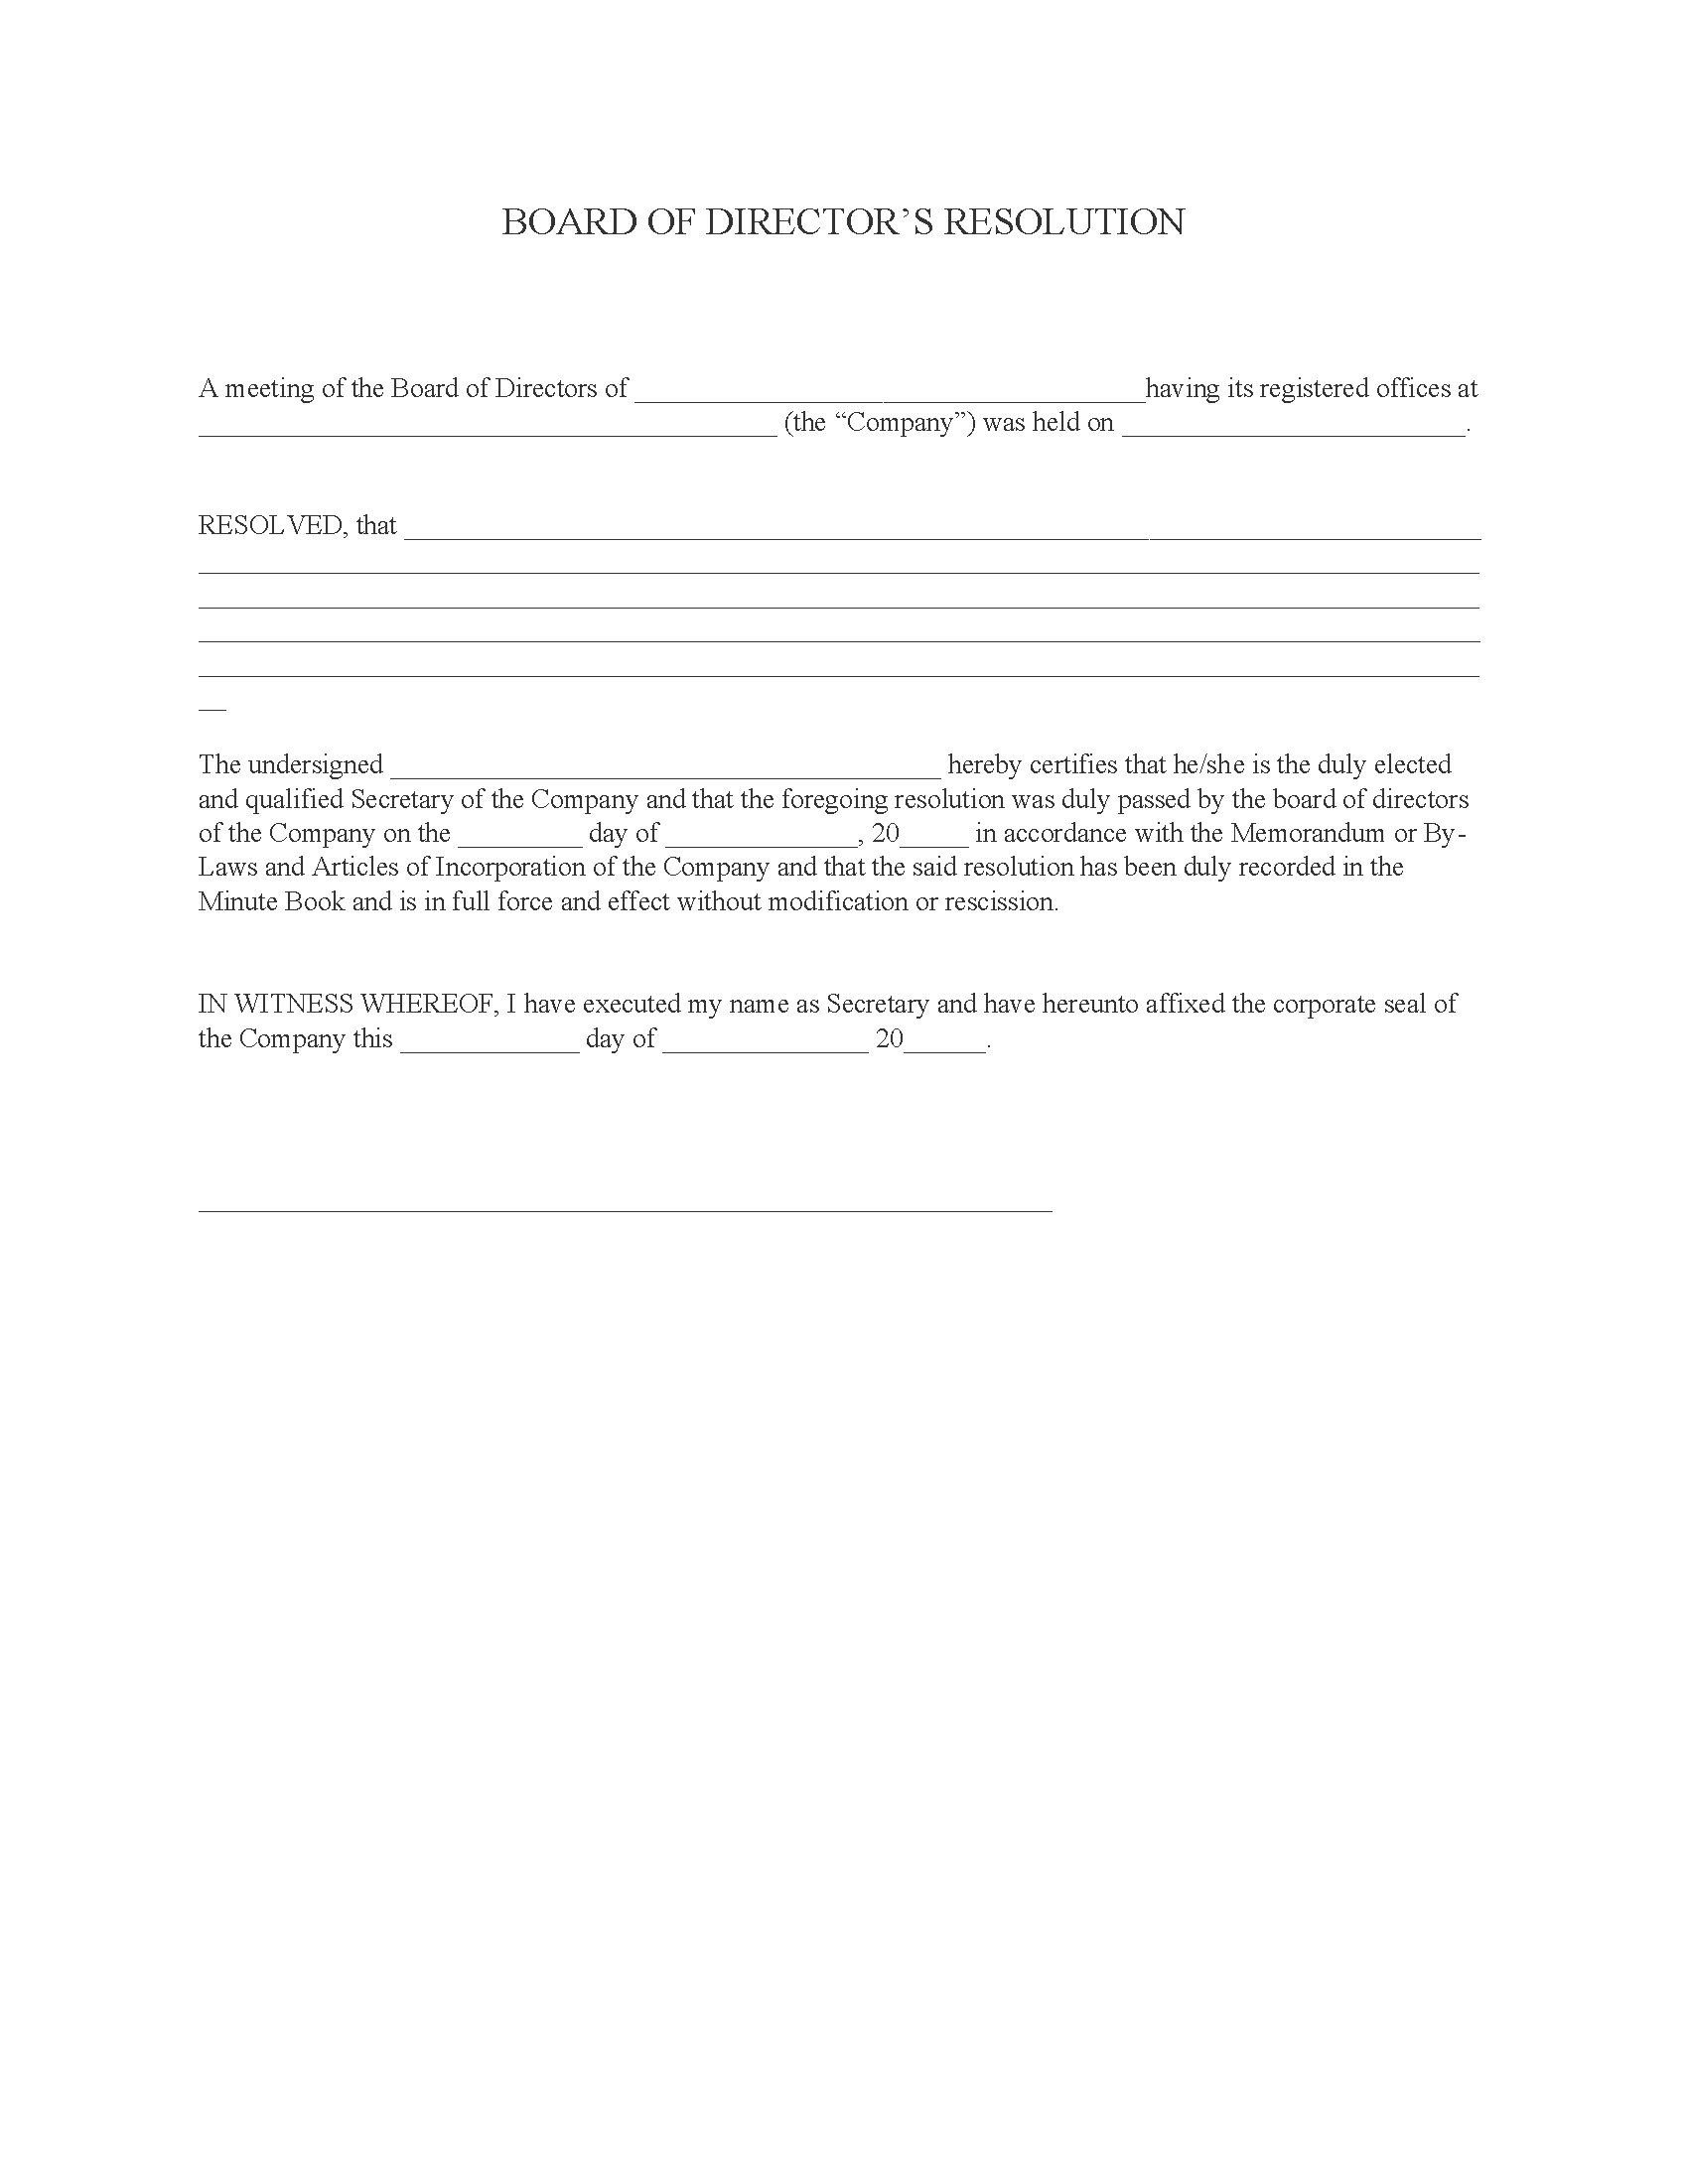 Board of Directors Resolution